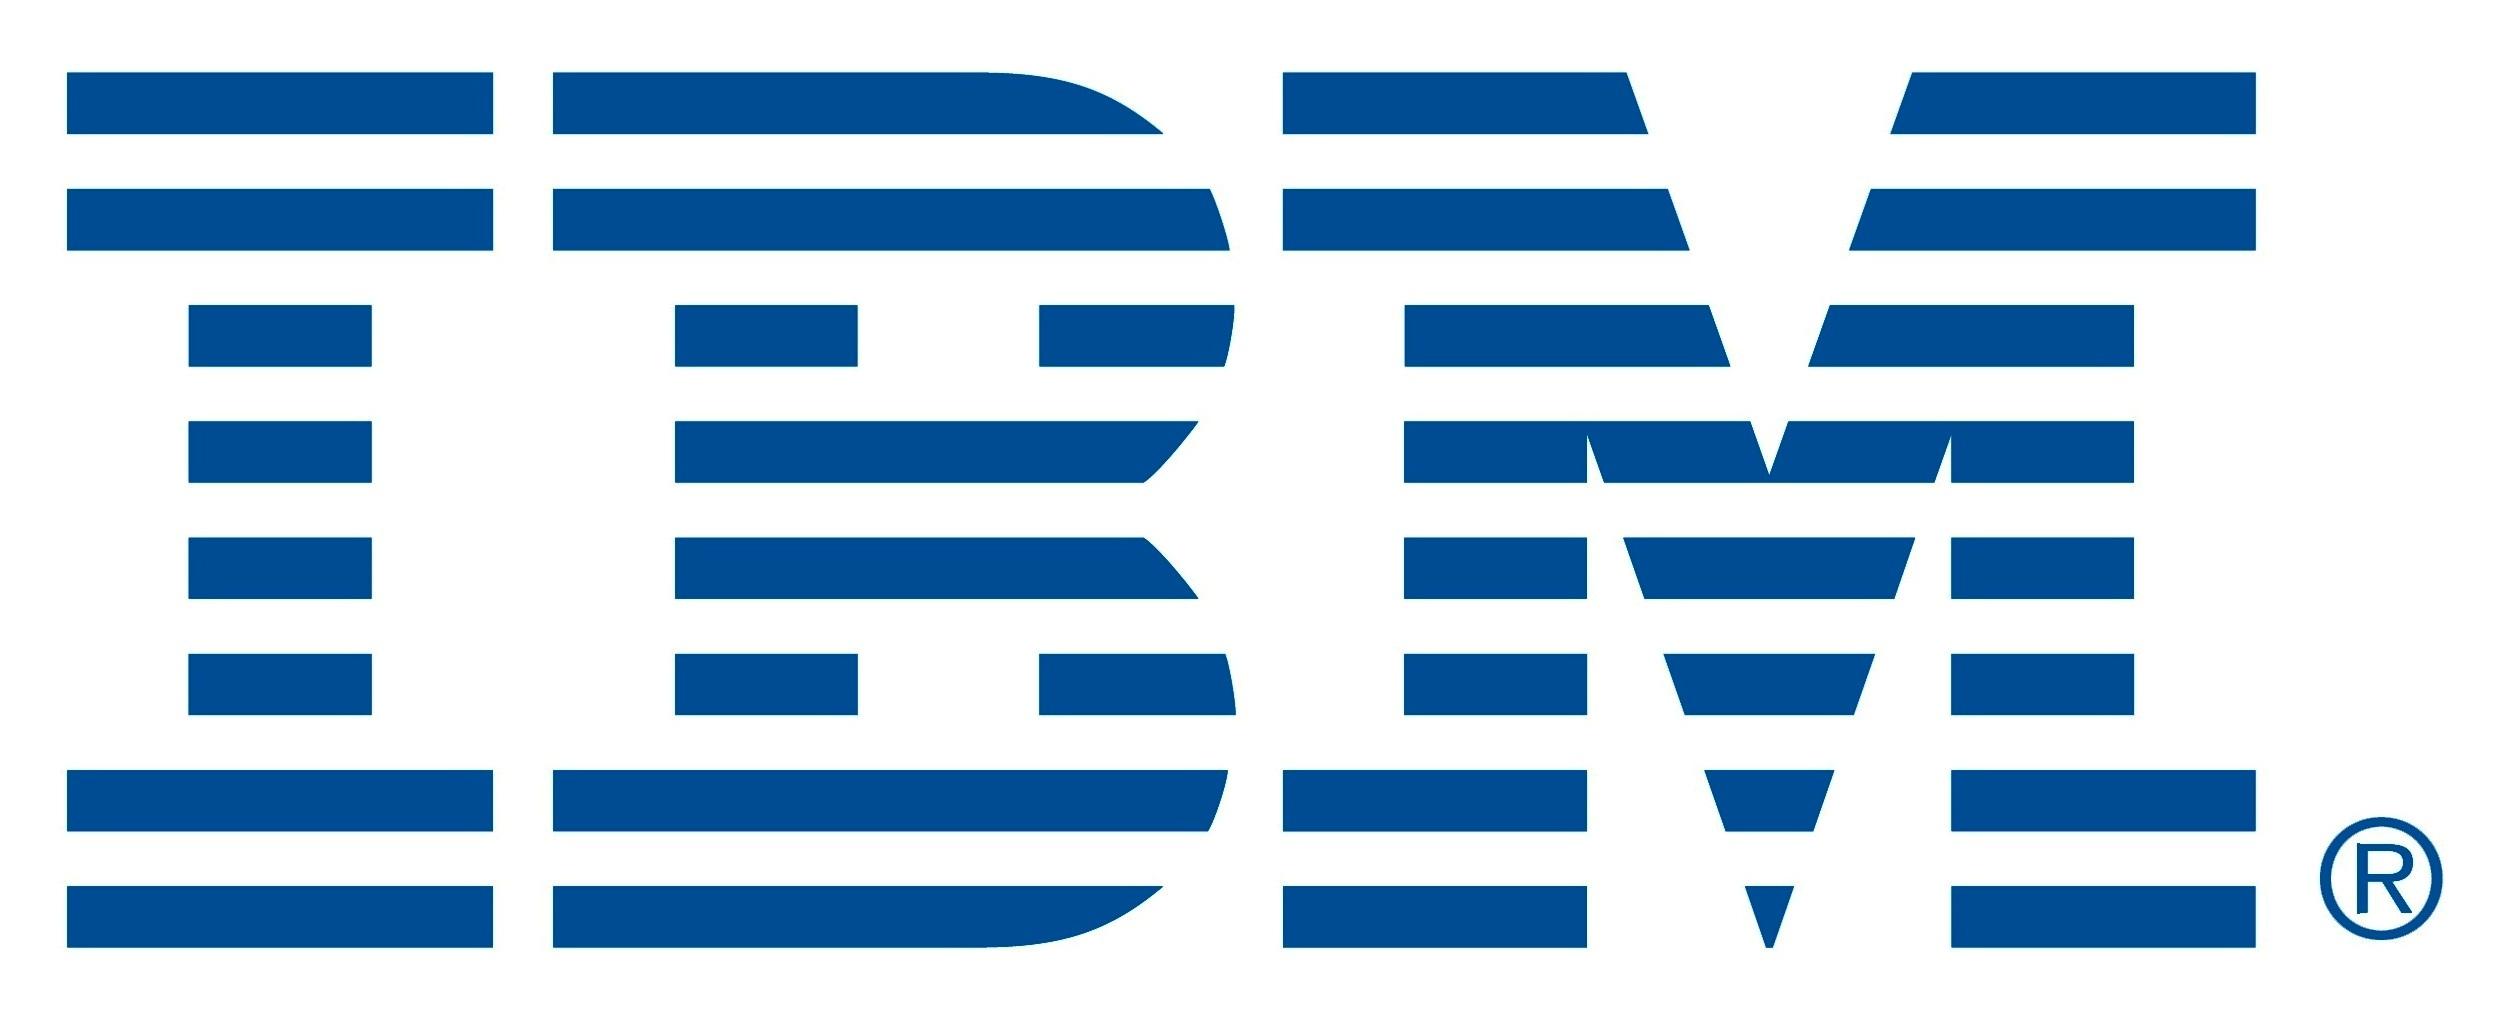 IBM logo - Tech History Today